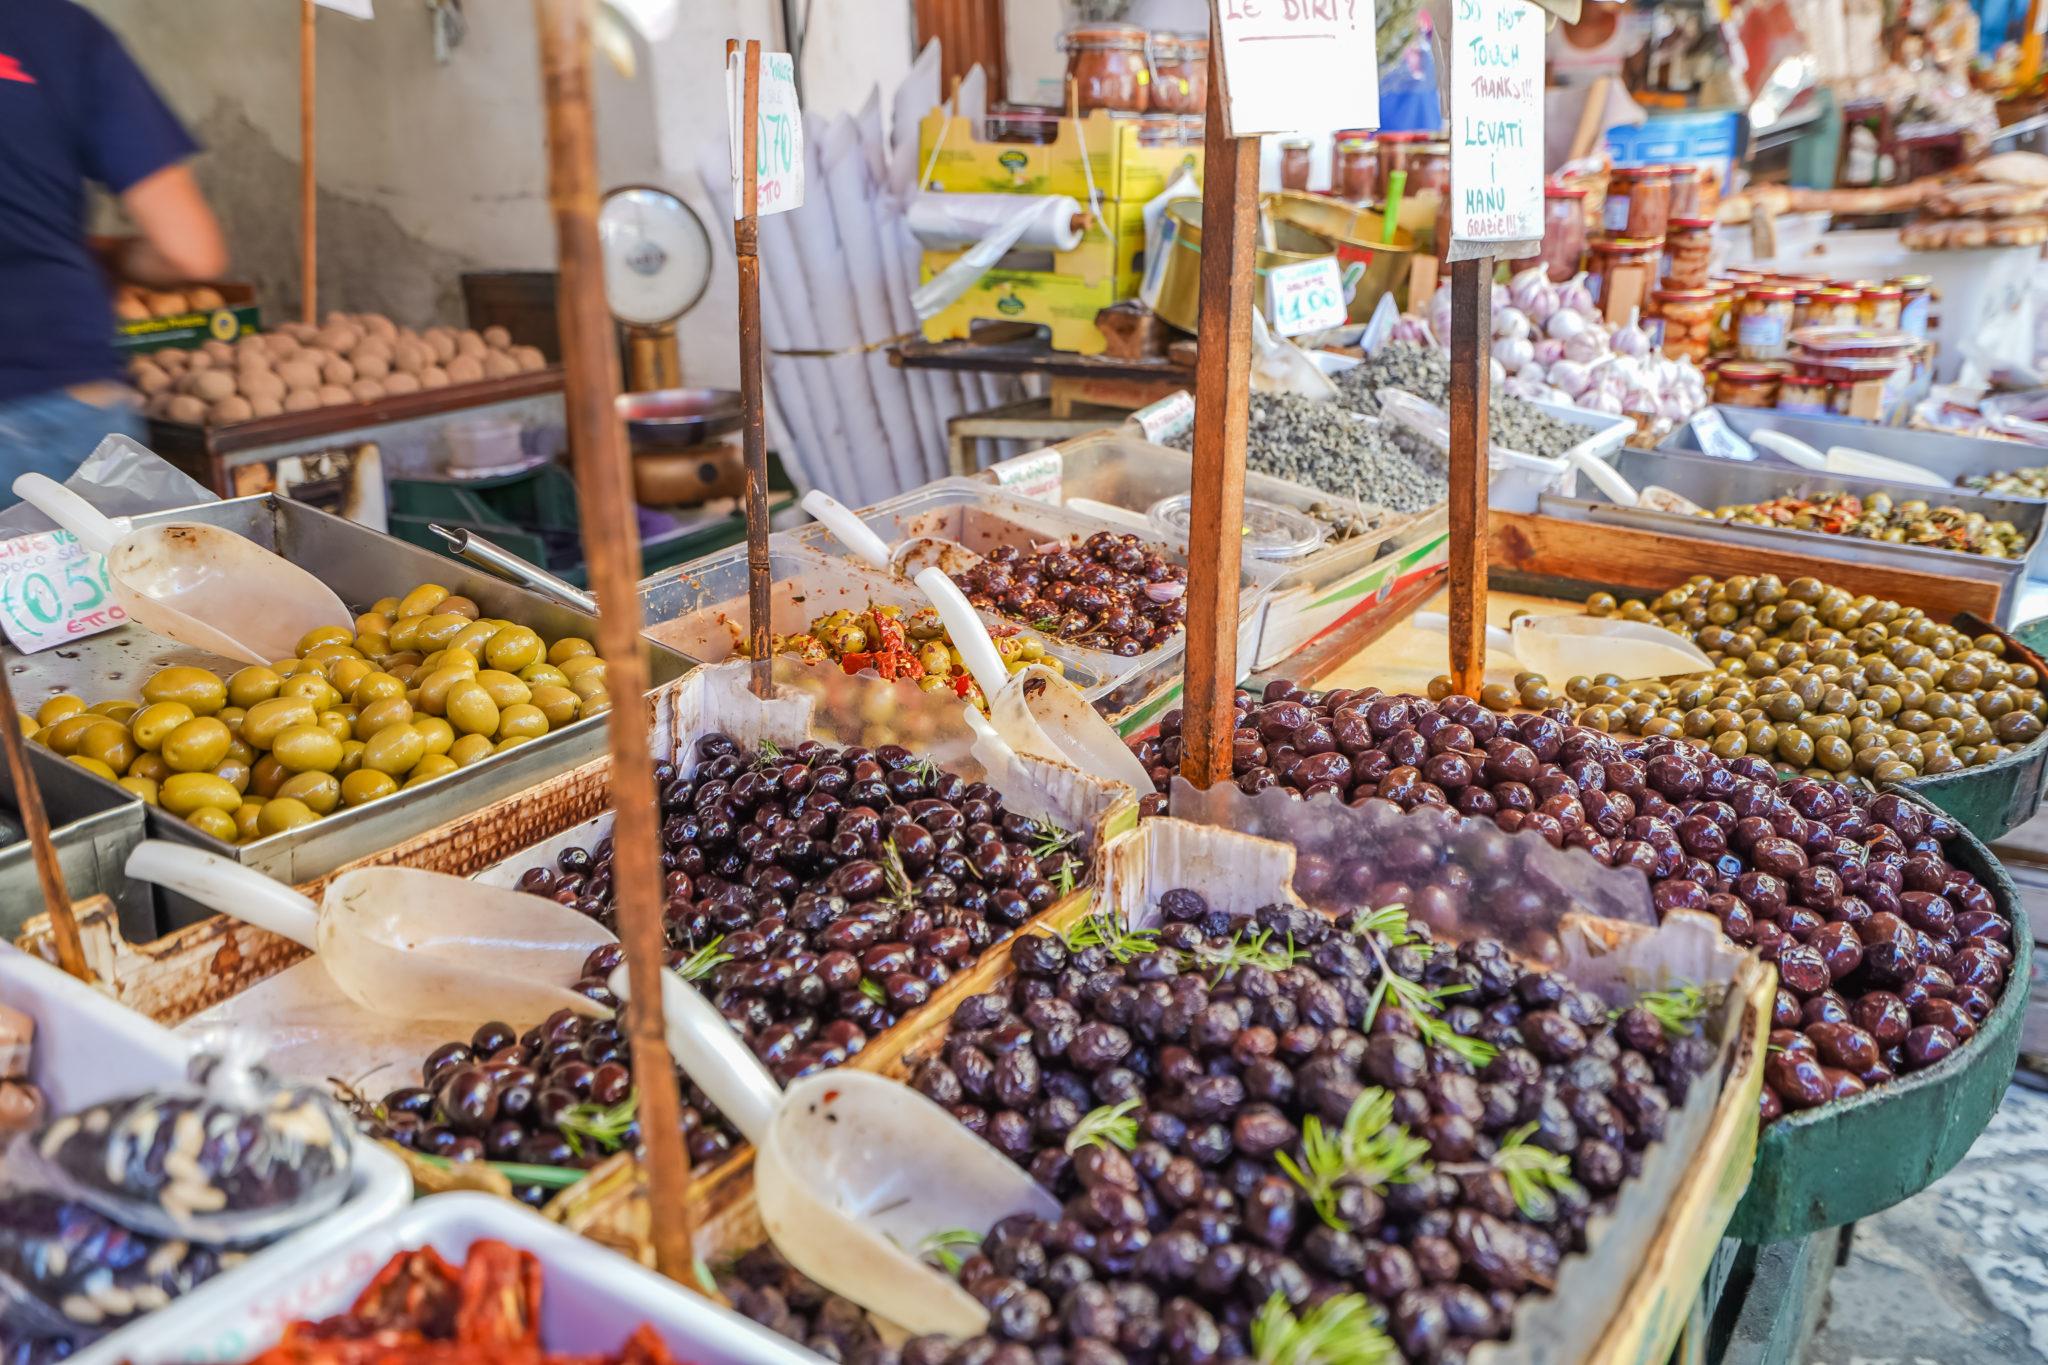 marché-palerme- Mercato-capo-sicile-italie.jpg